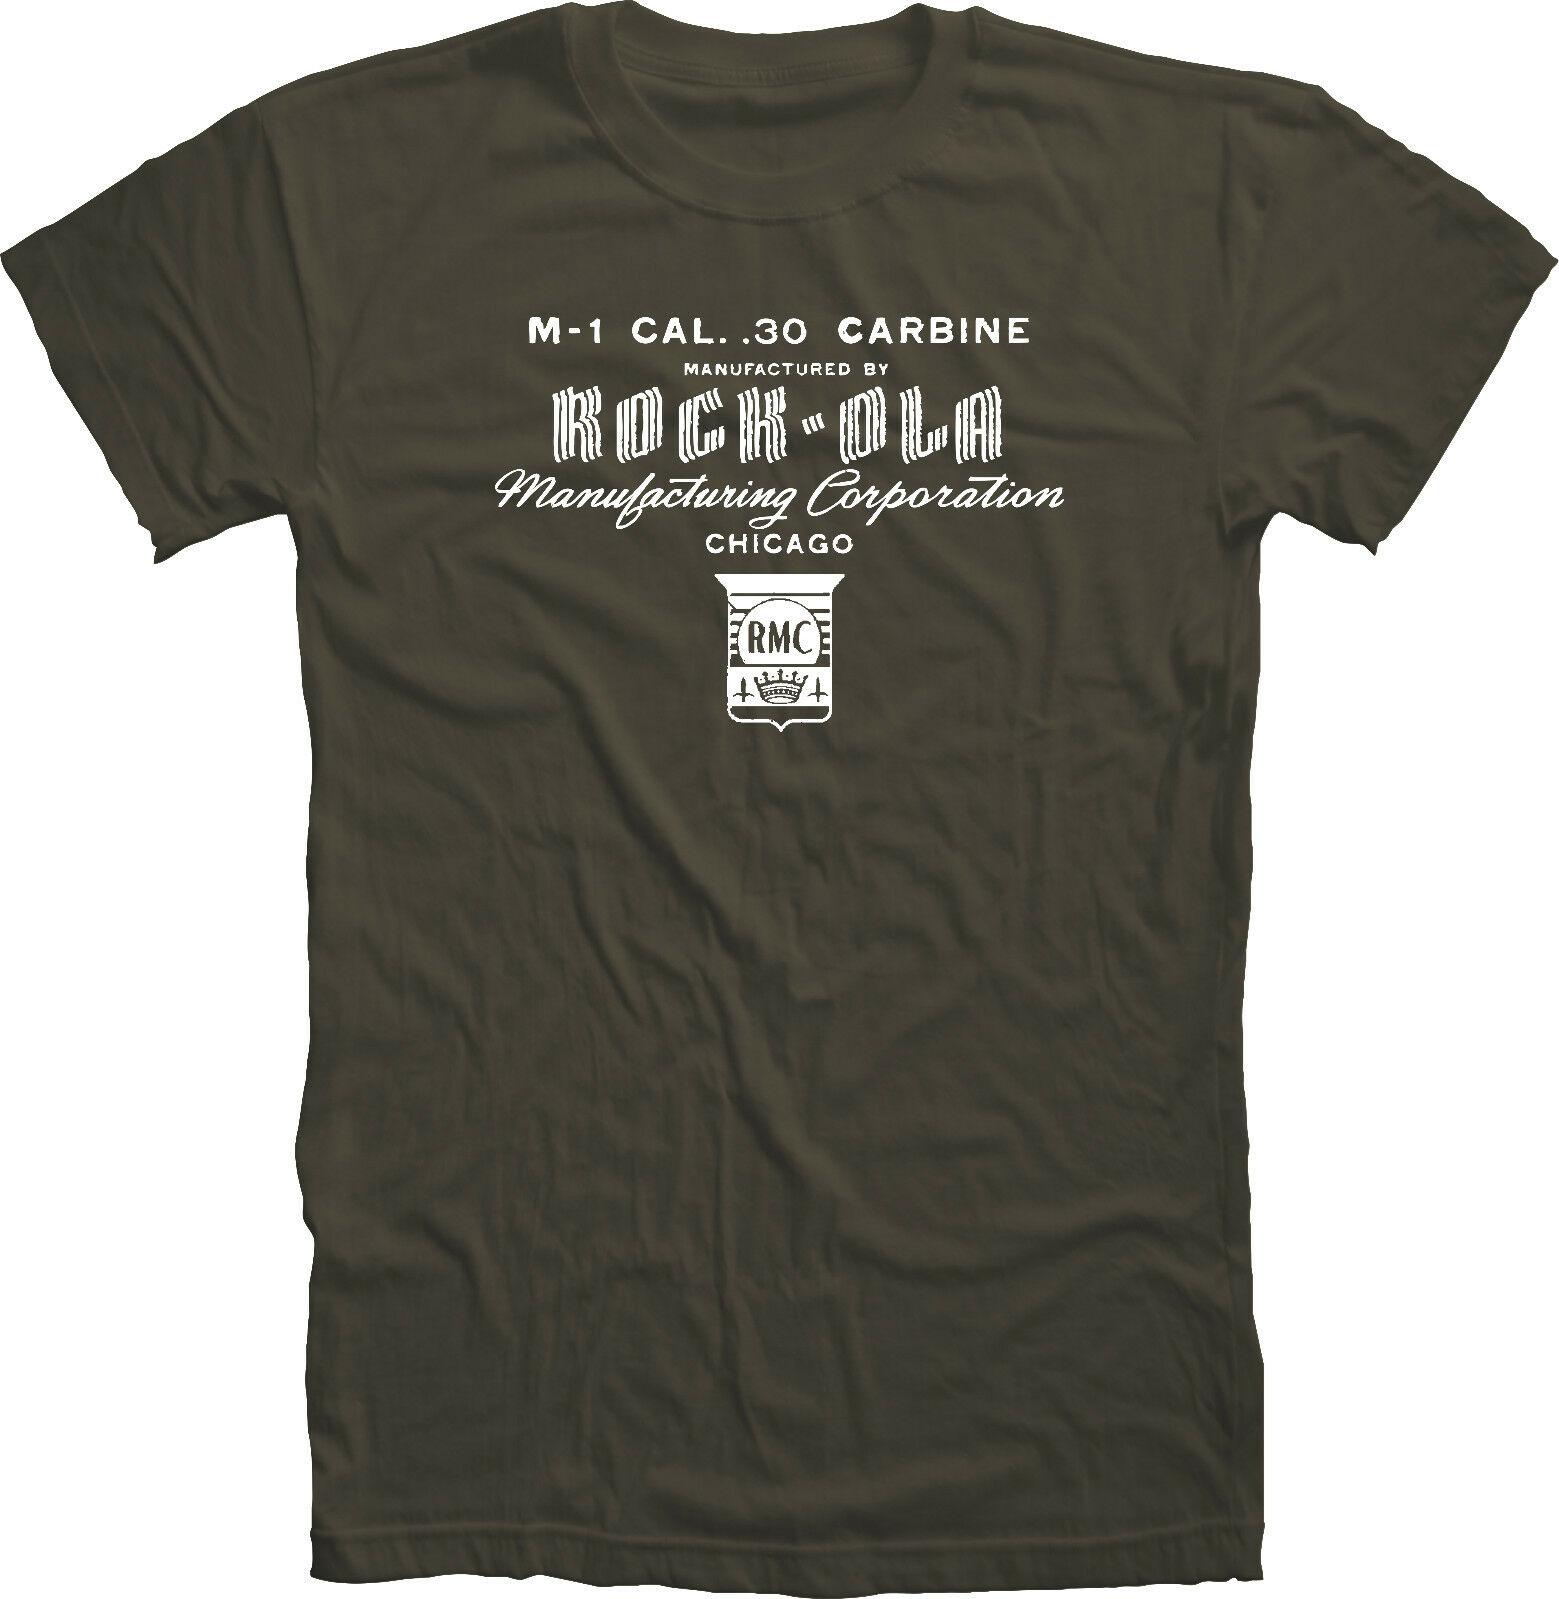 Wwii M1 Carbine Rock-Ola camiseta receptora algodón Unisex camisetas